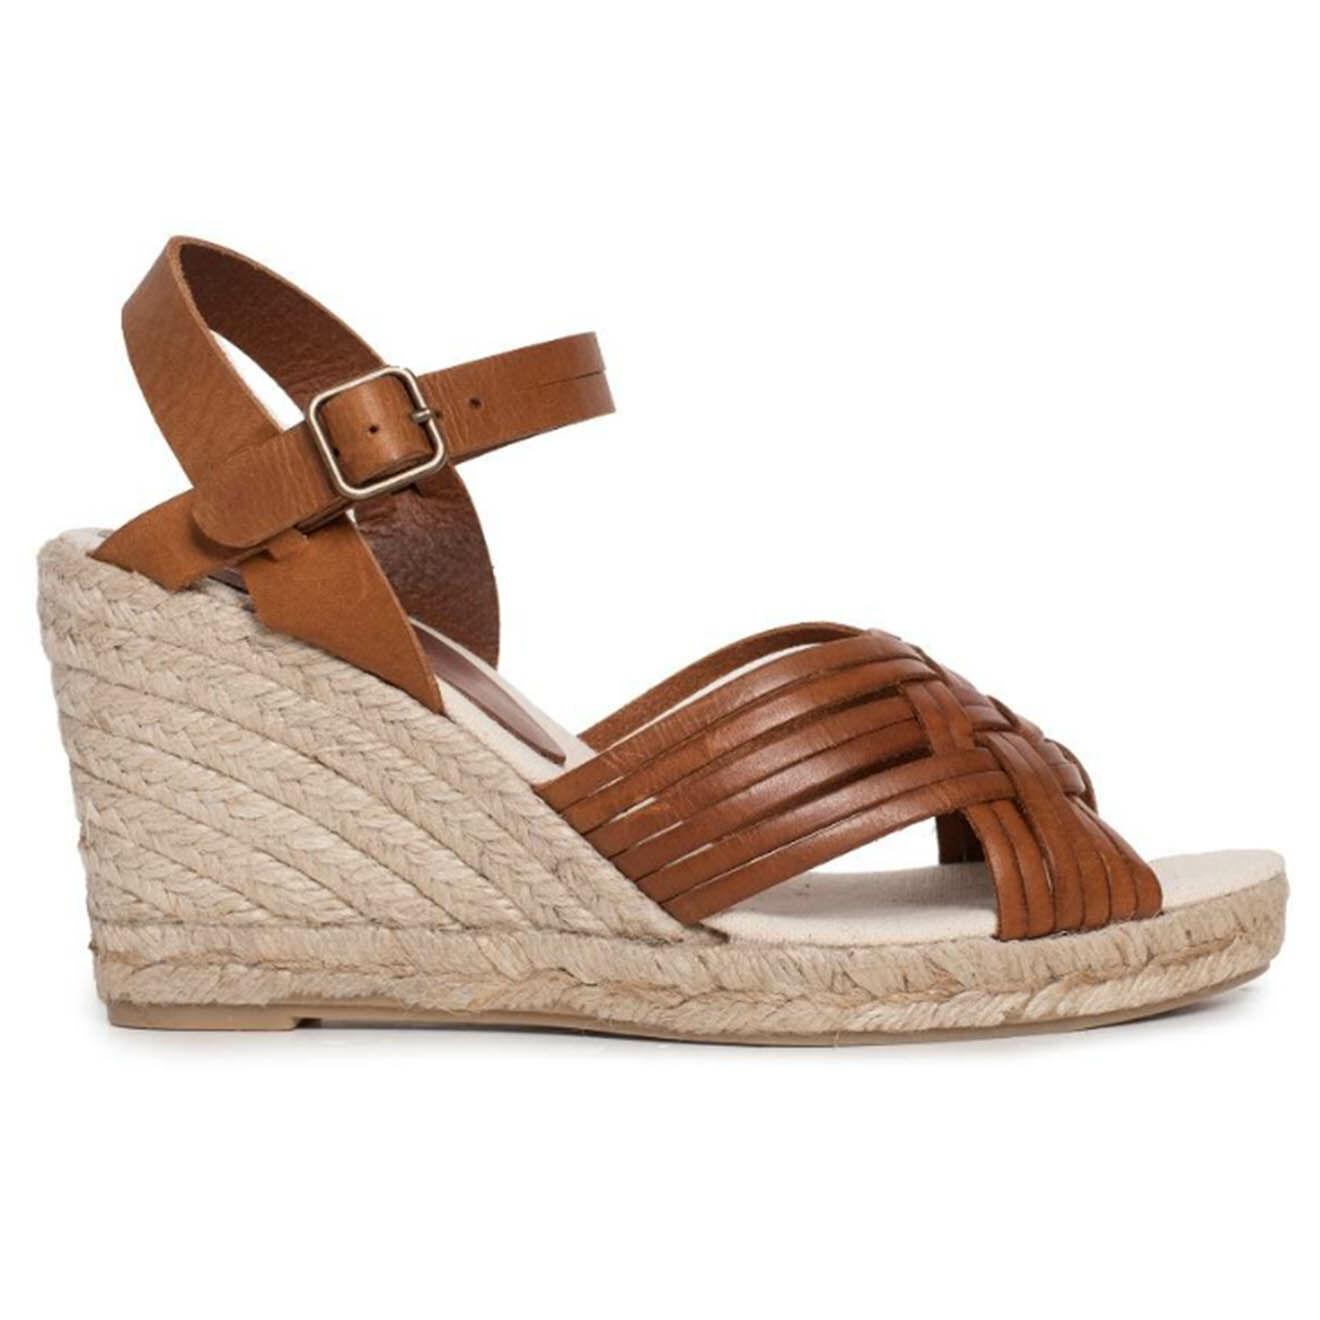 Sandales compensées en Cuir Paloa brandy - Talon 9 cm - Anaki - Modalova